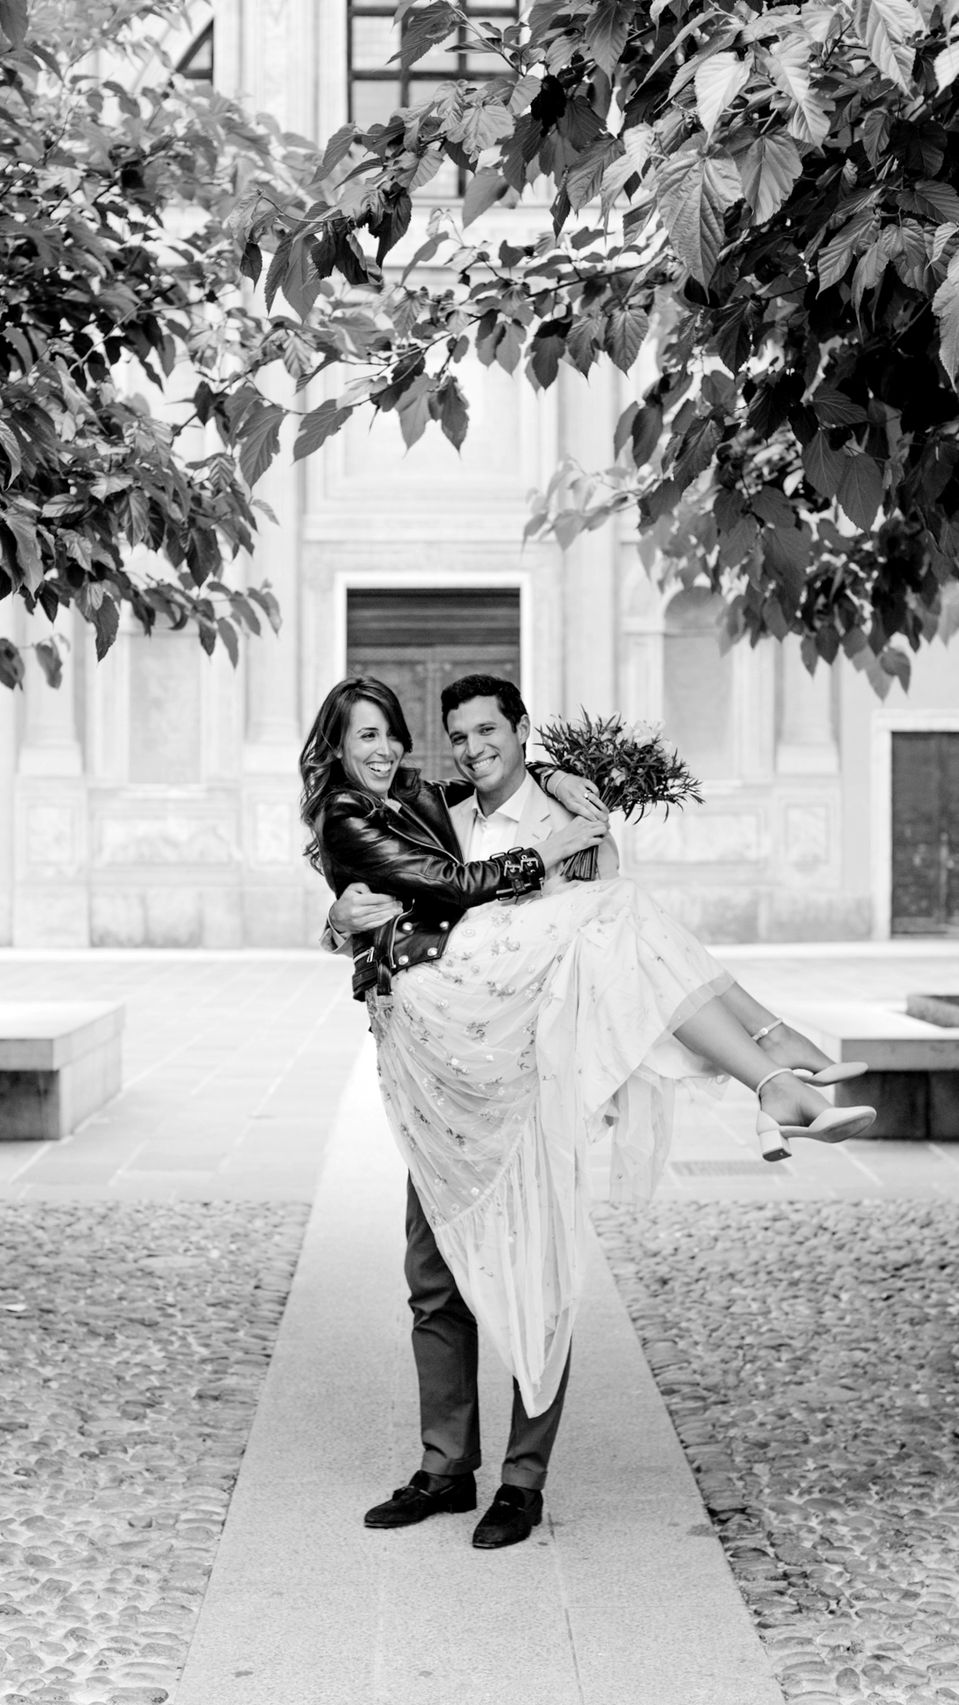 Chiara & Roberto